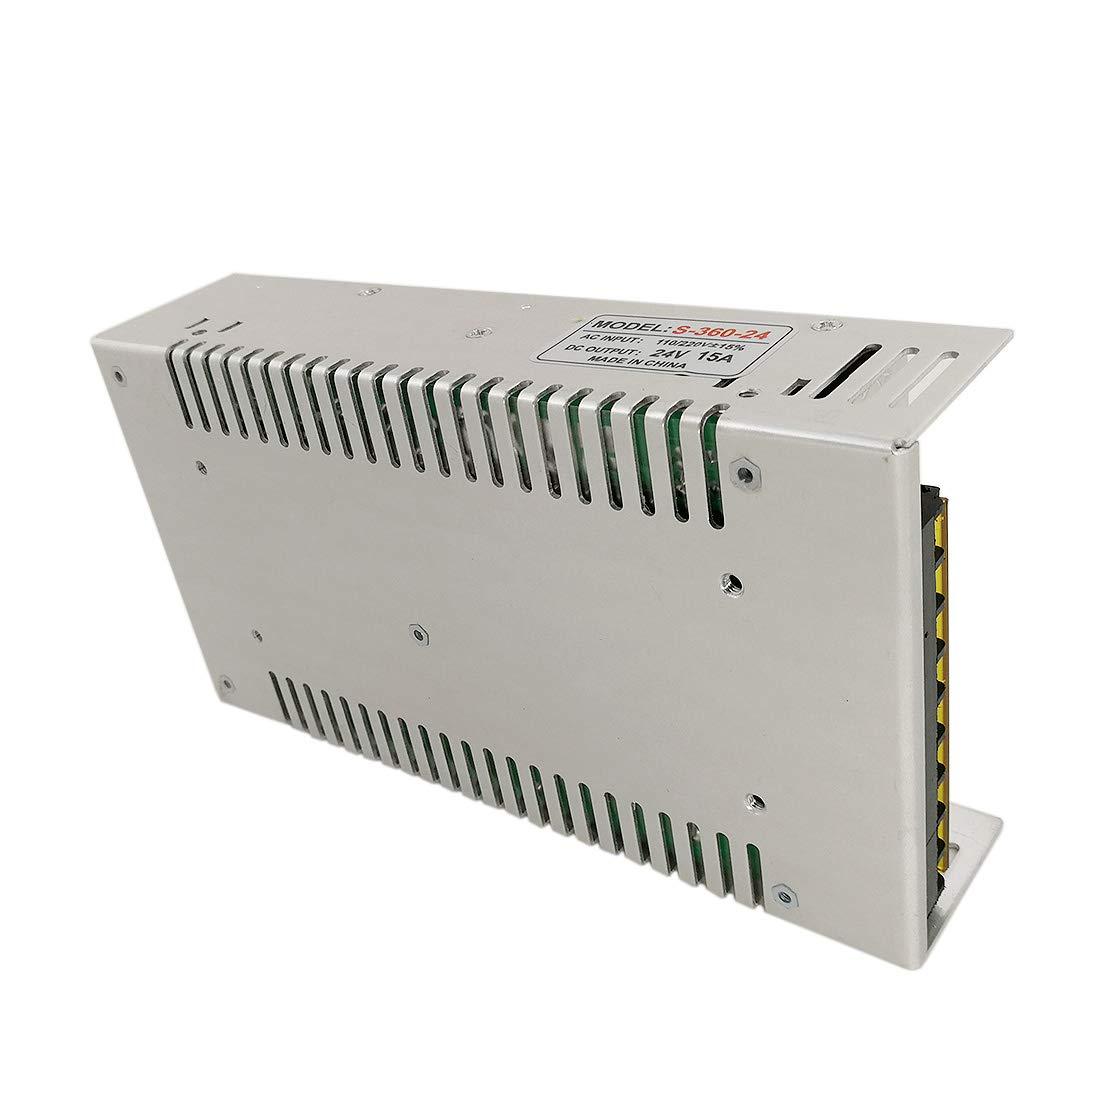 JOYLIT 360W Transformador de Voltage Alimentaci/ón de Interruptor AC 220V a 24V DC 15A Fuente de Alimentaci/ón para Tira de LED